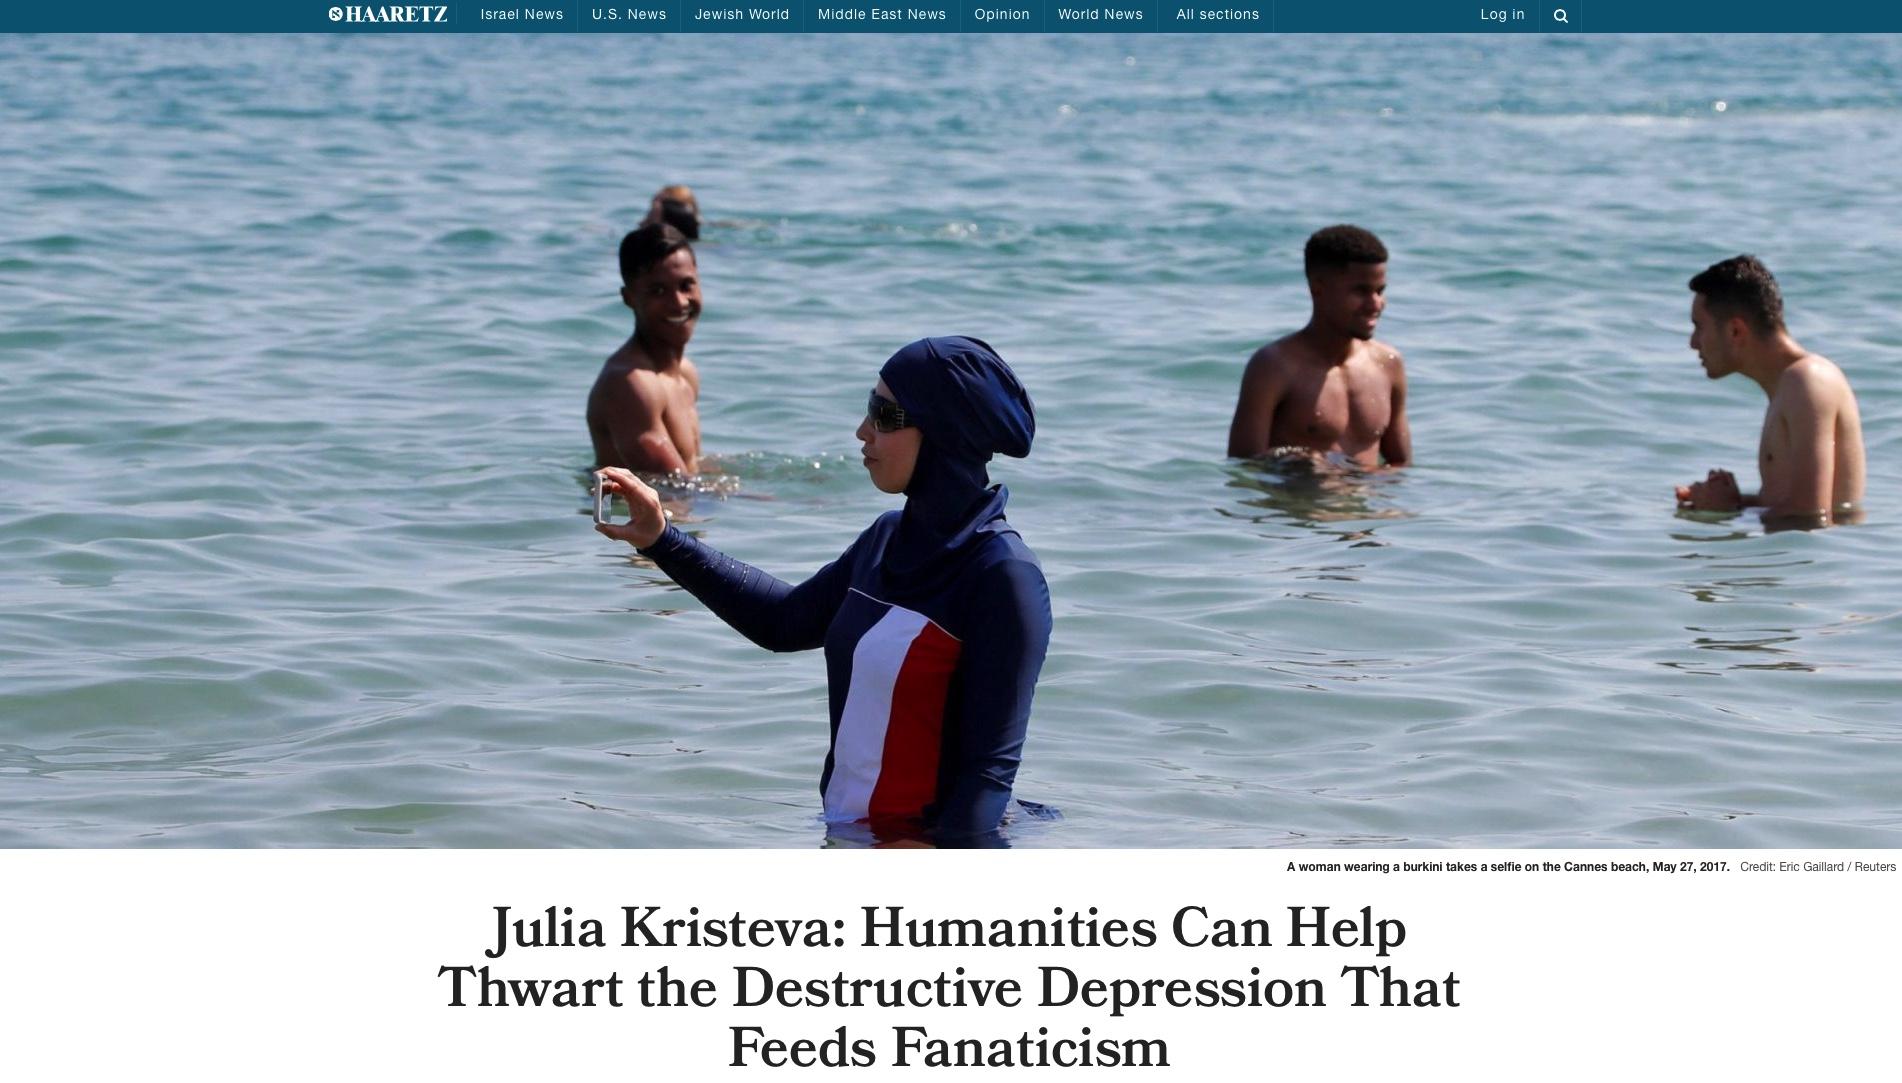 Julia Kristeva: The humanities can help thwart the destructive